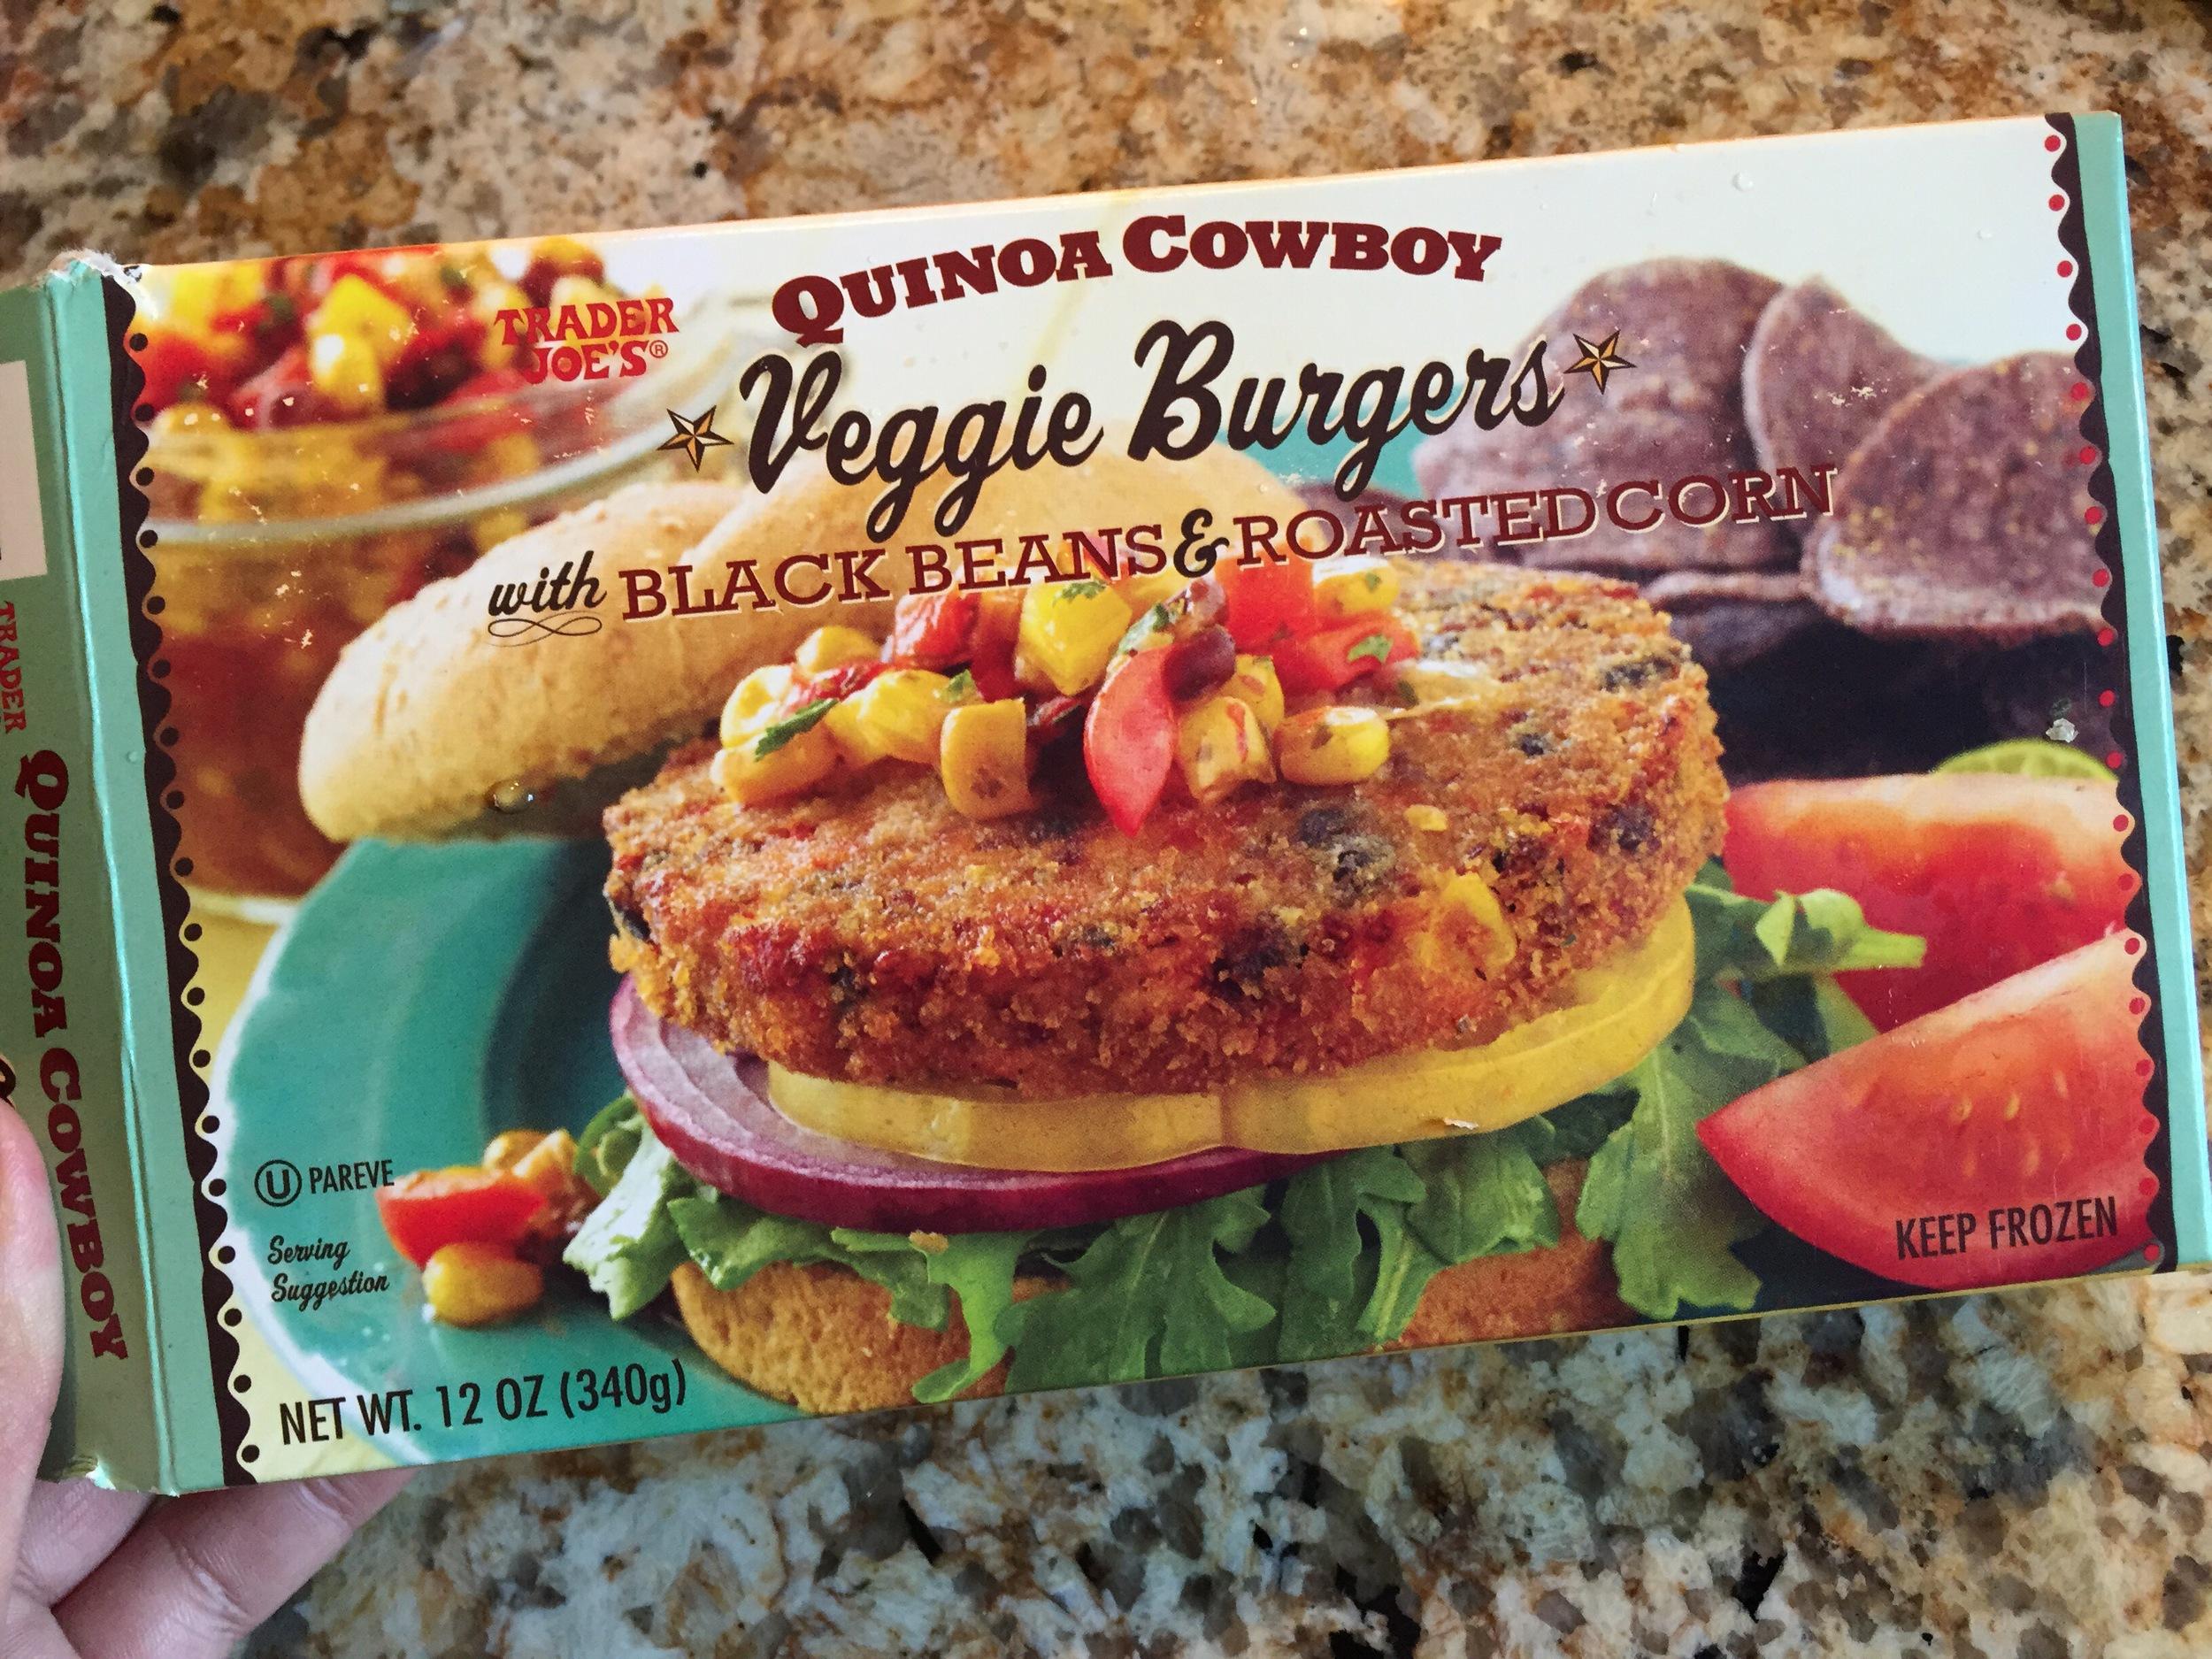 Trader joes burger 3-1.JPG